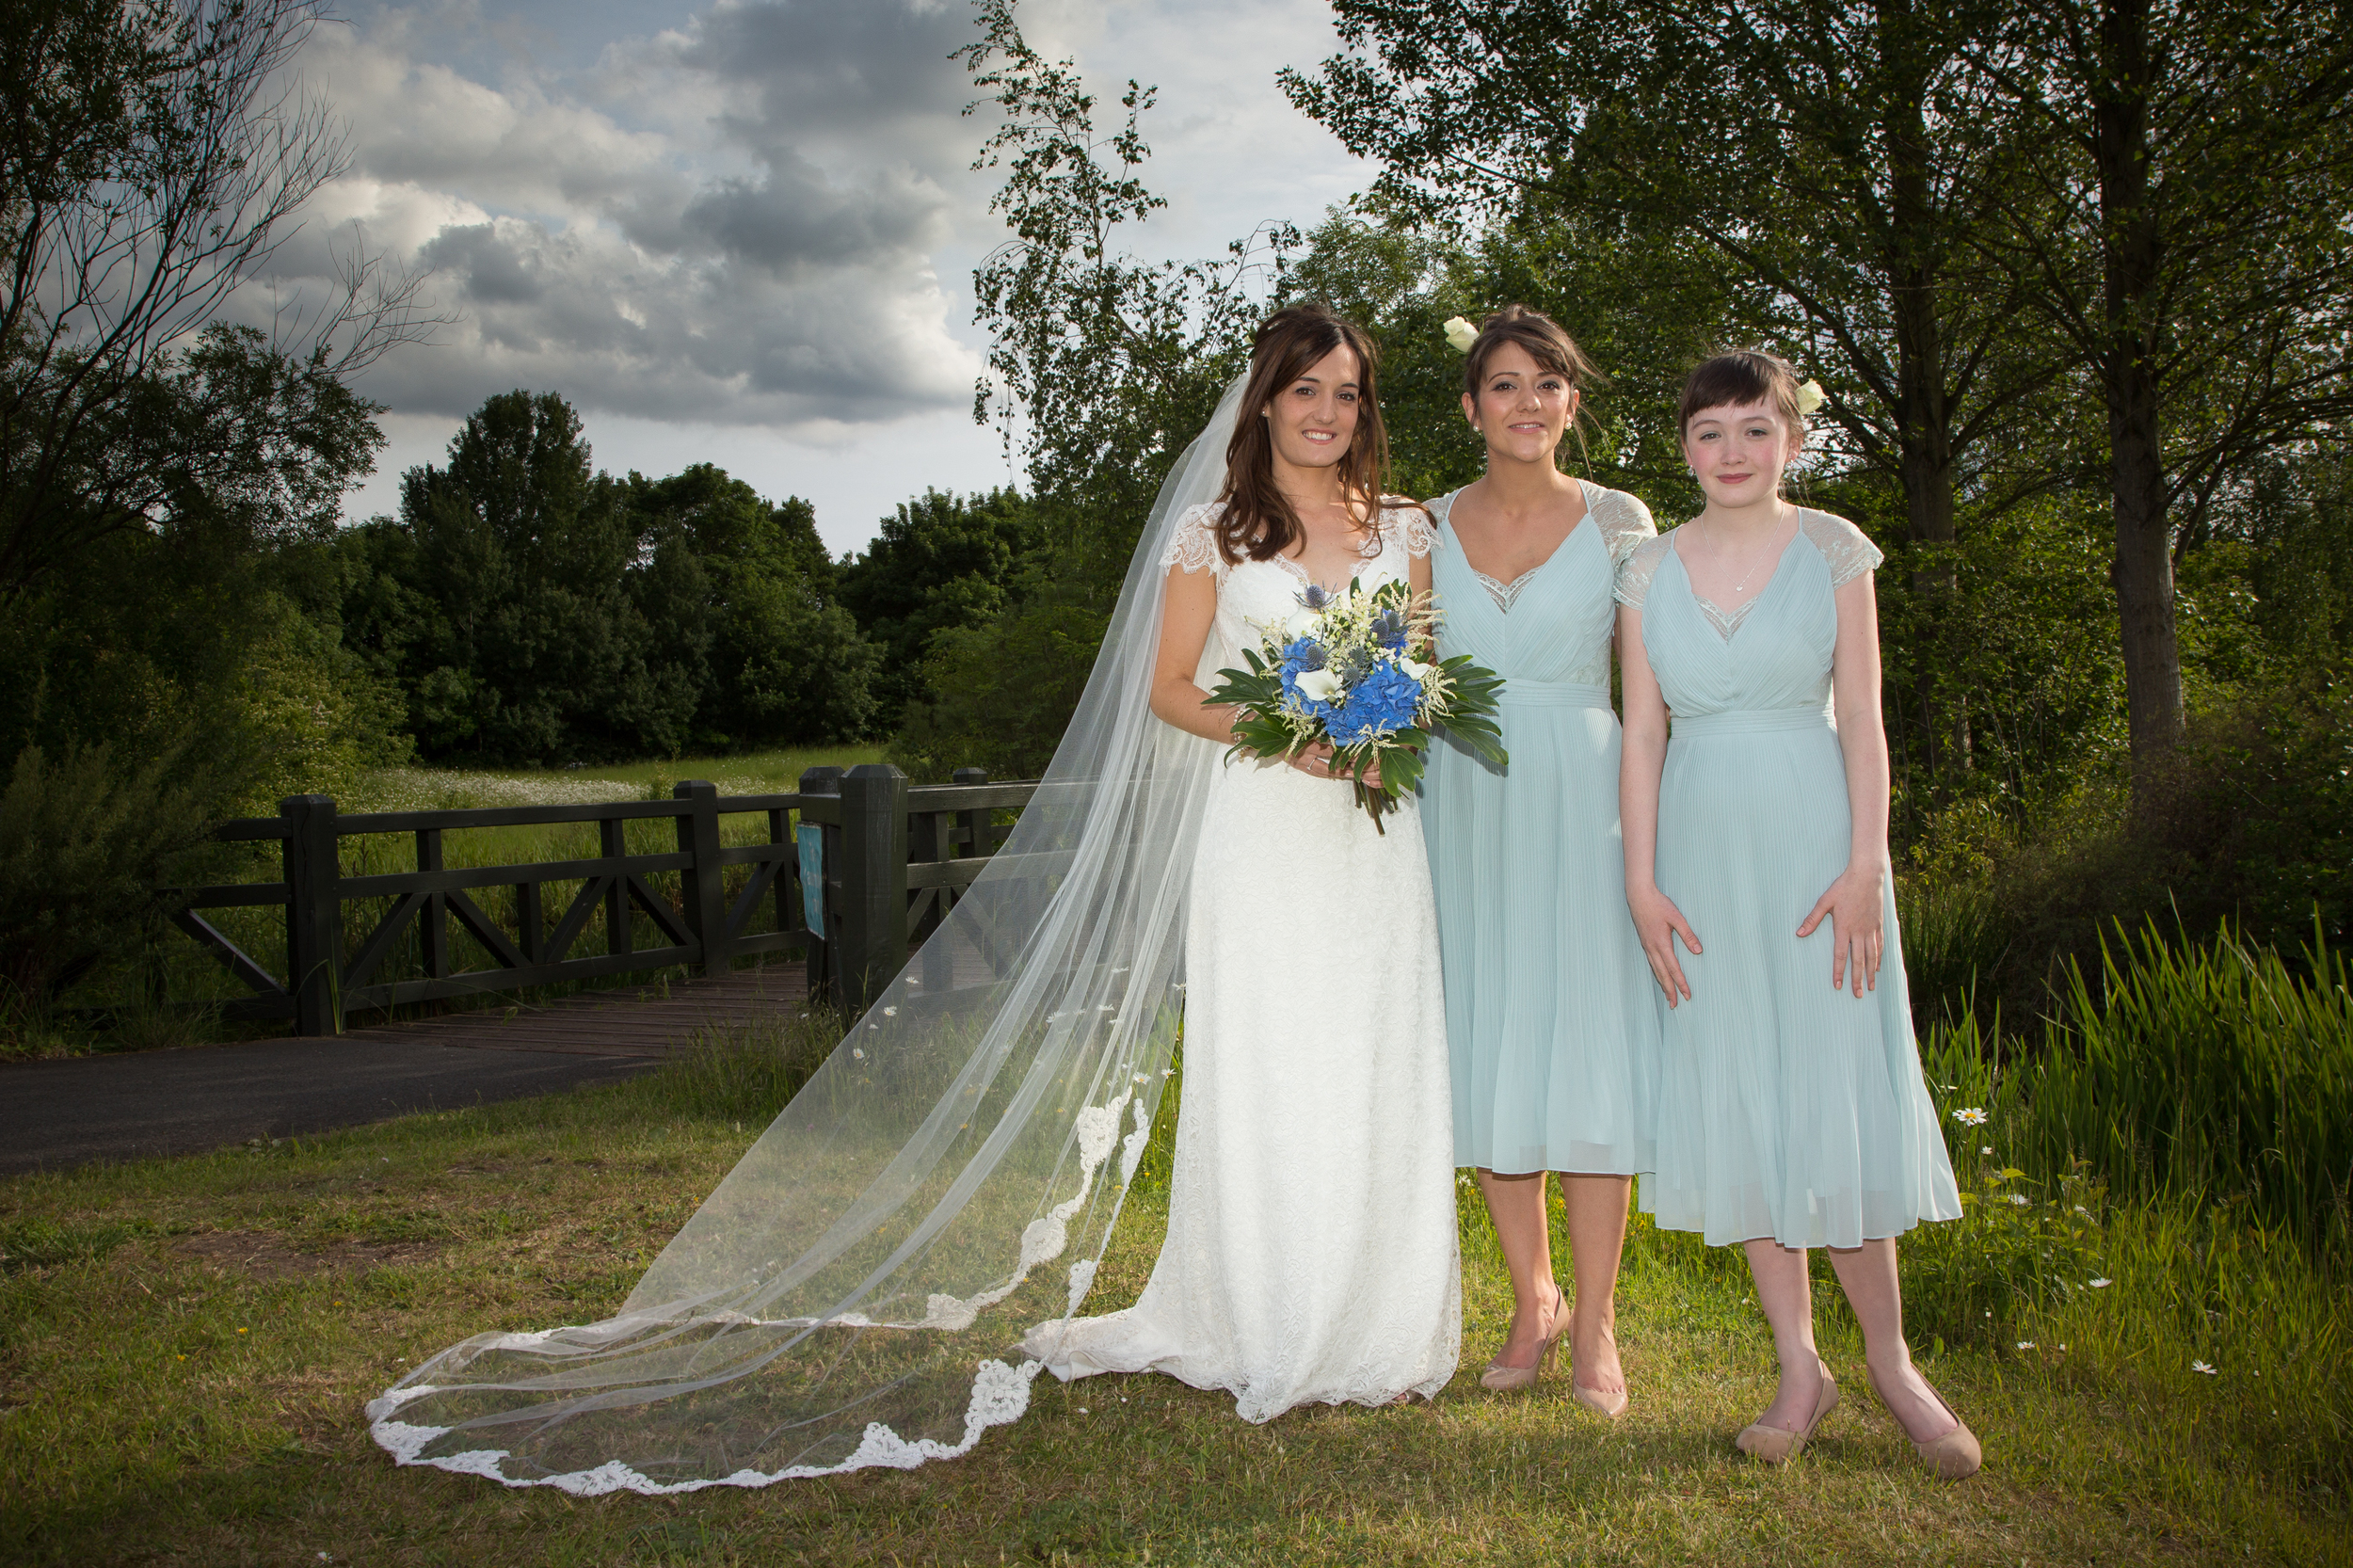 barnes-wetlands-centre-bridesmaids-london-uk-destination-wedding-photography-Adam-Rowley